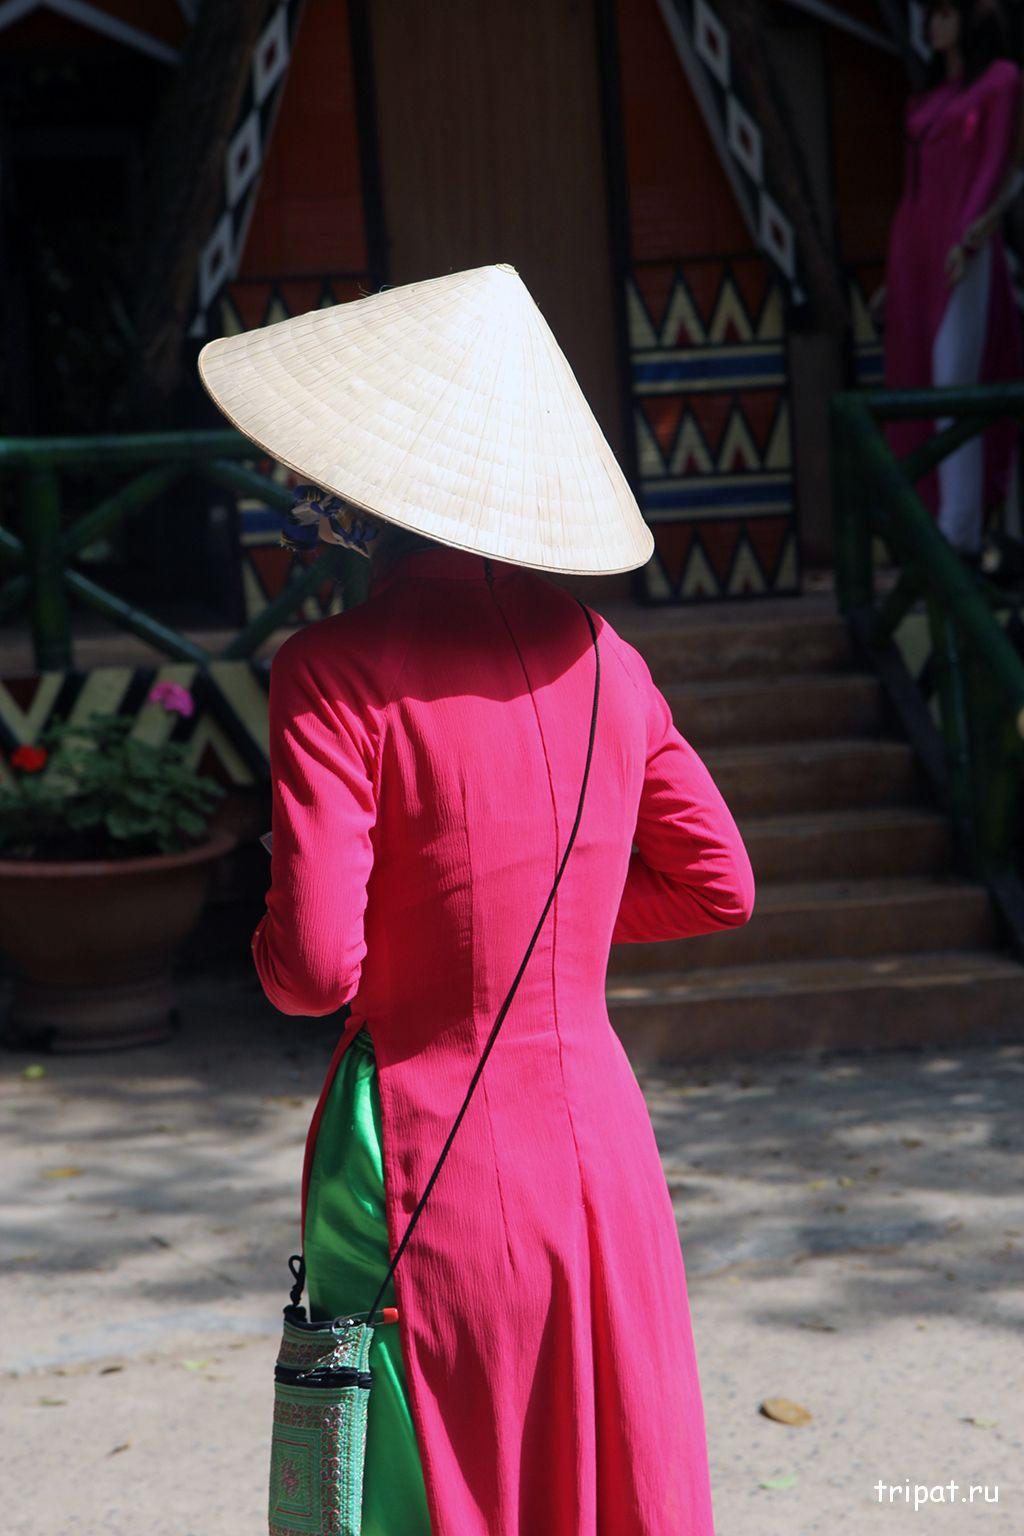 вьетнамская одежда